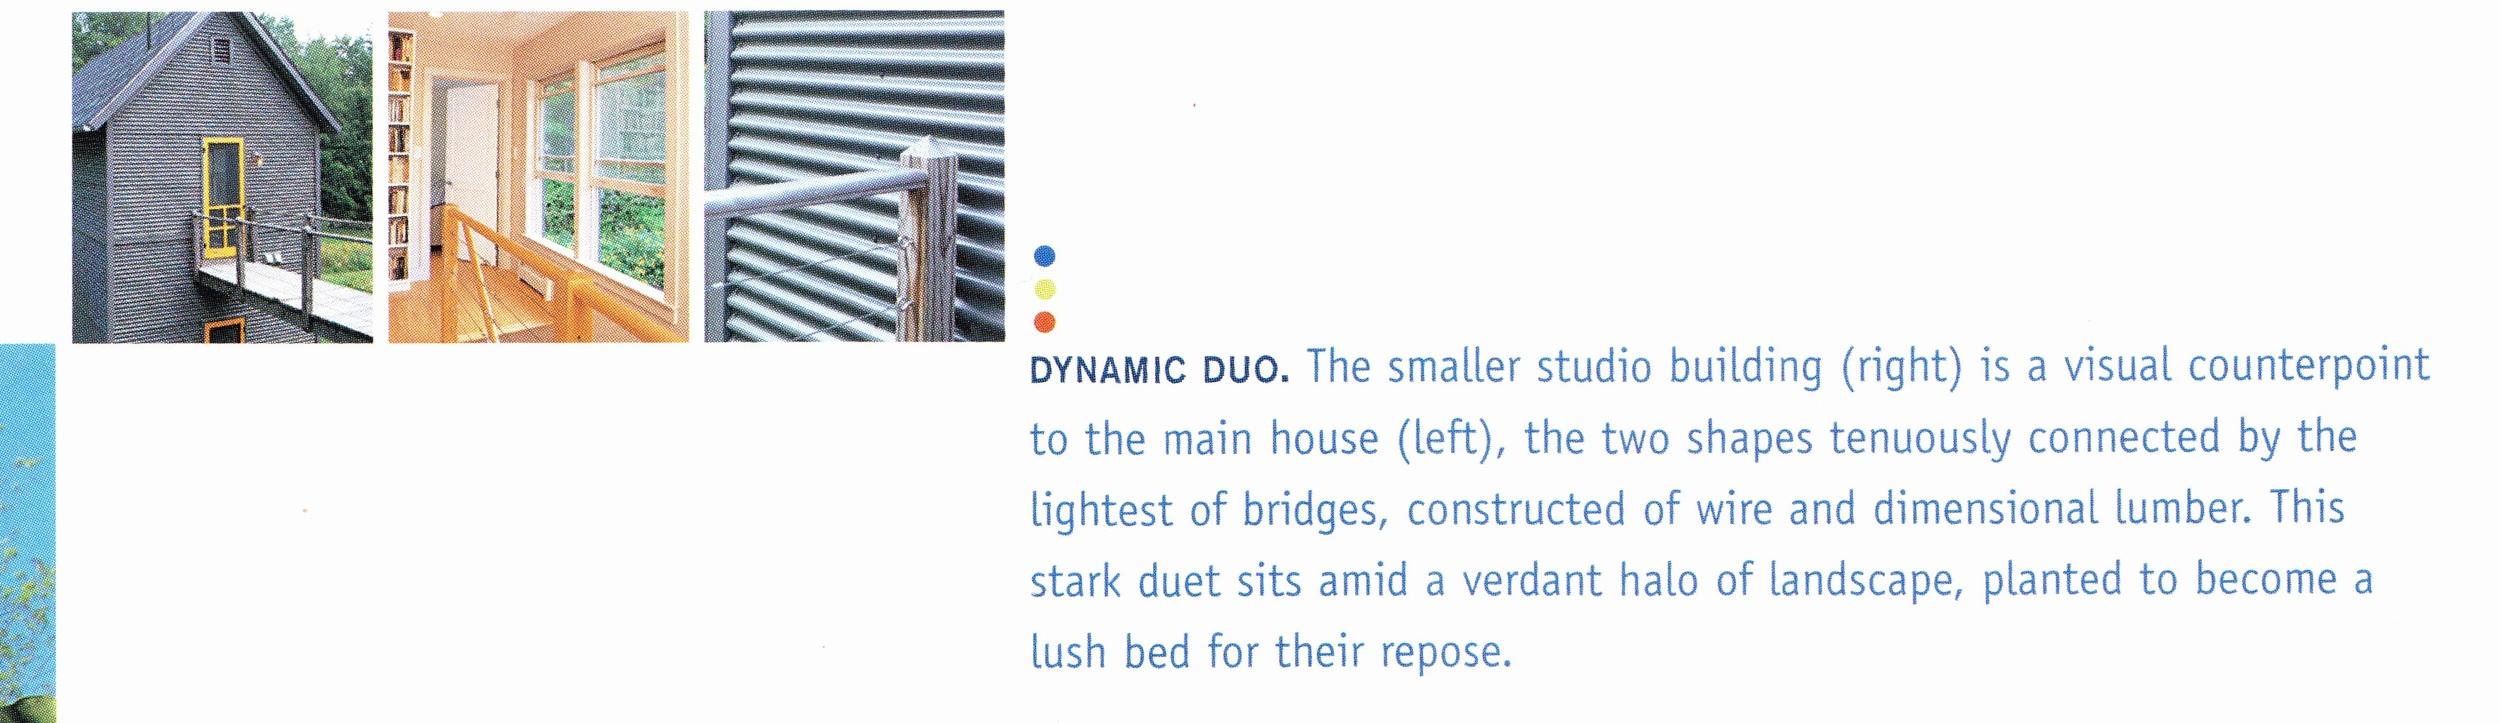 House on a Budget_0003.jpg